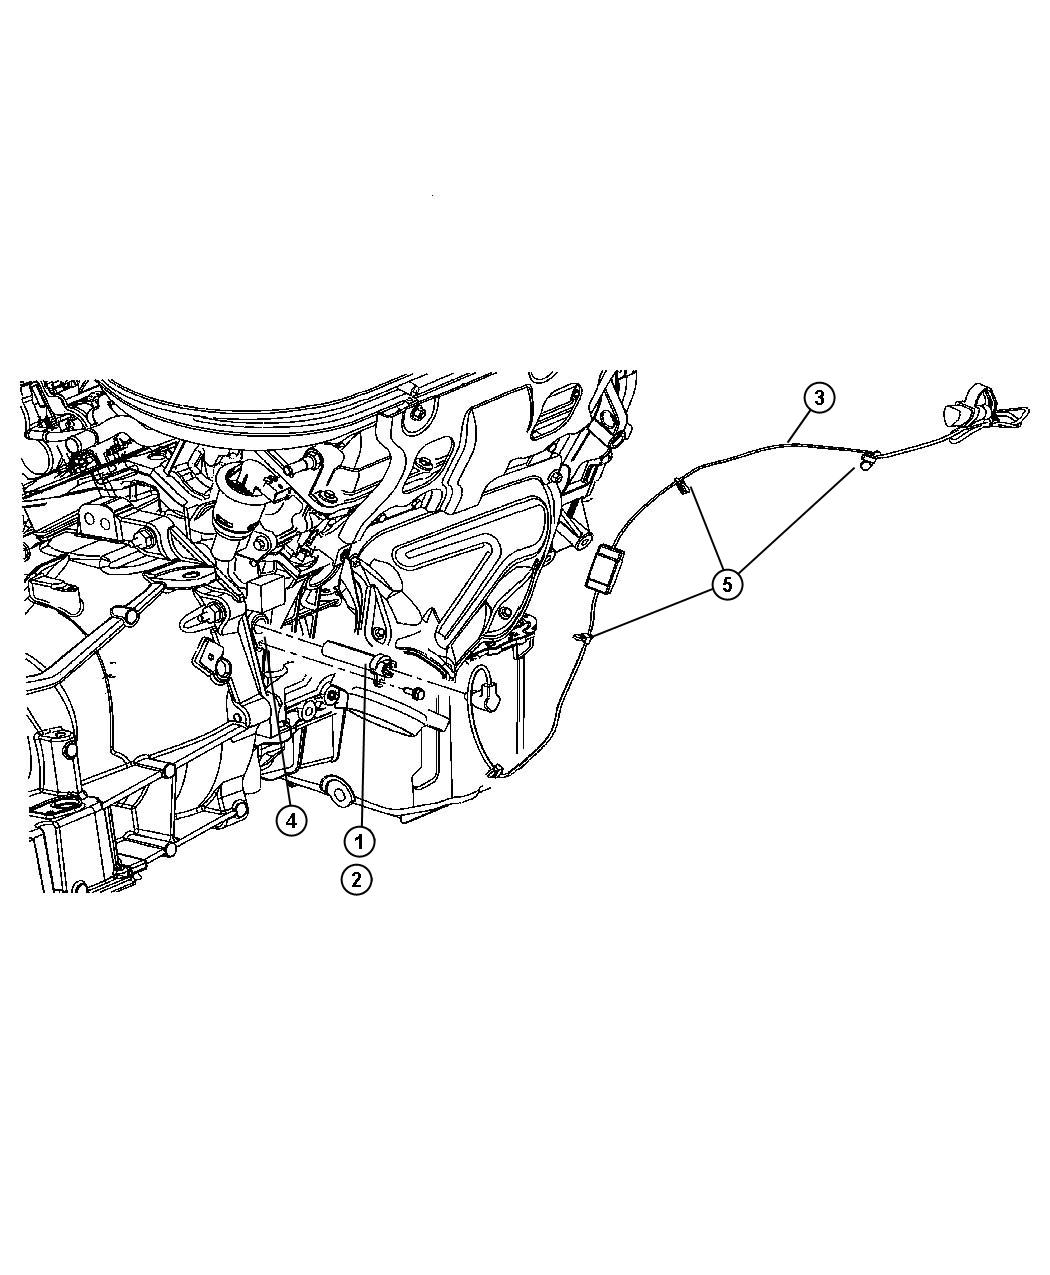 Dodge Grand Caravan Cord. Engine block heater. After 07/09